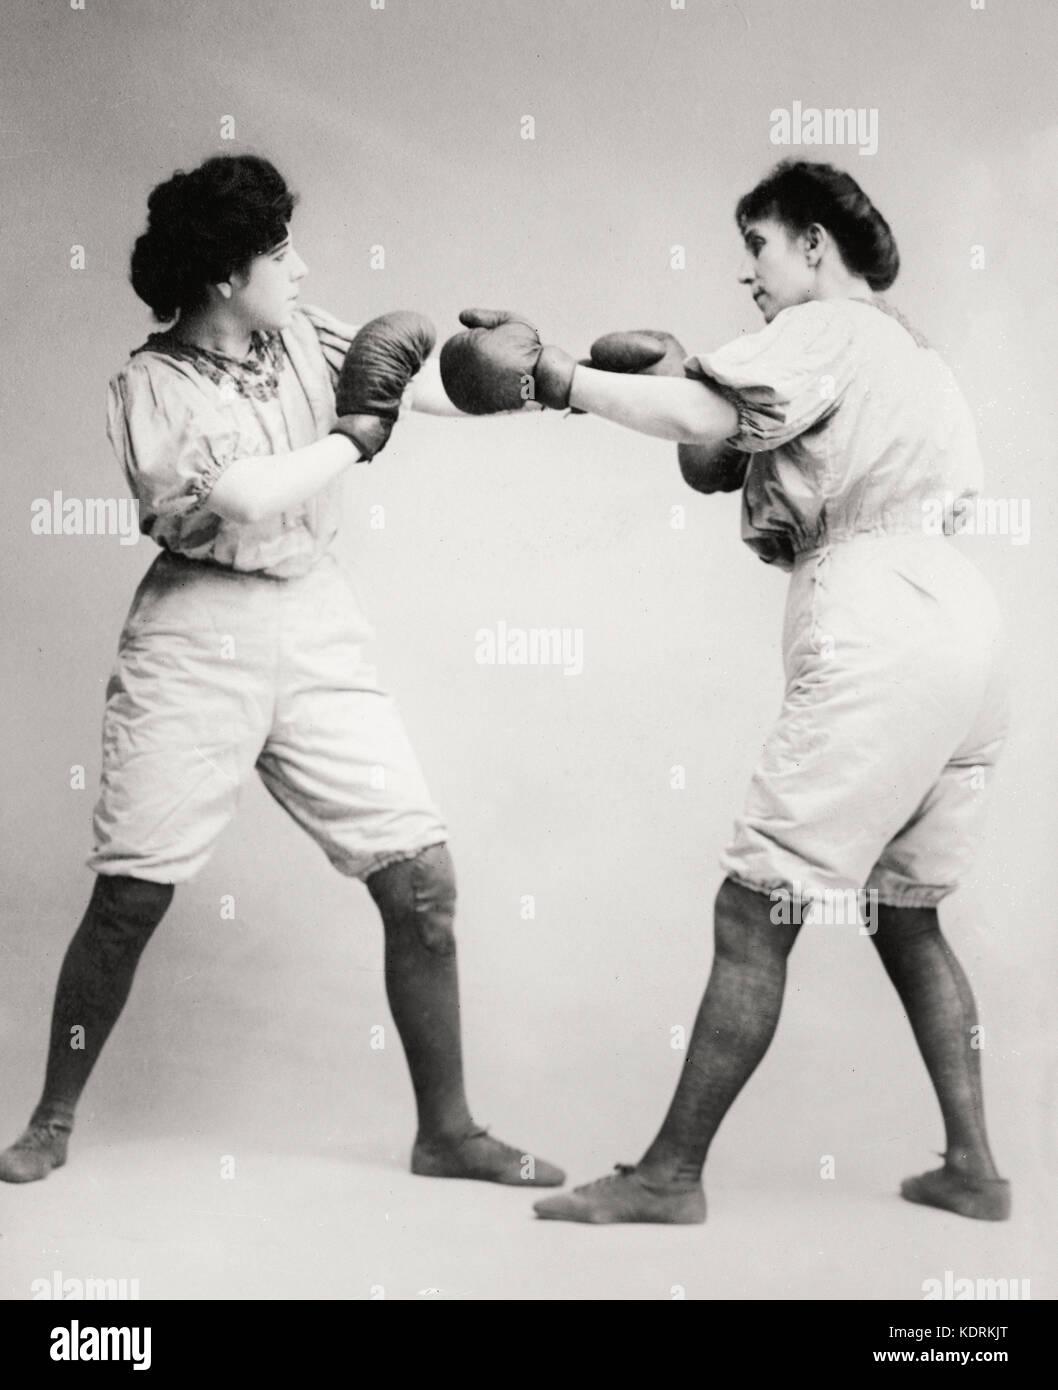 Bennett sœurs boxe, vers 1910 Photo Stock